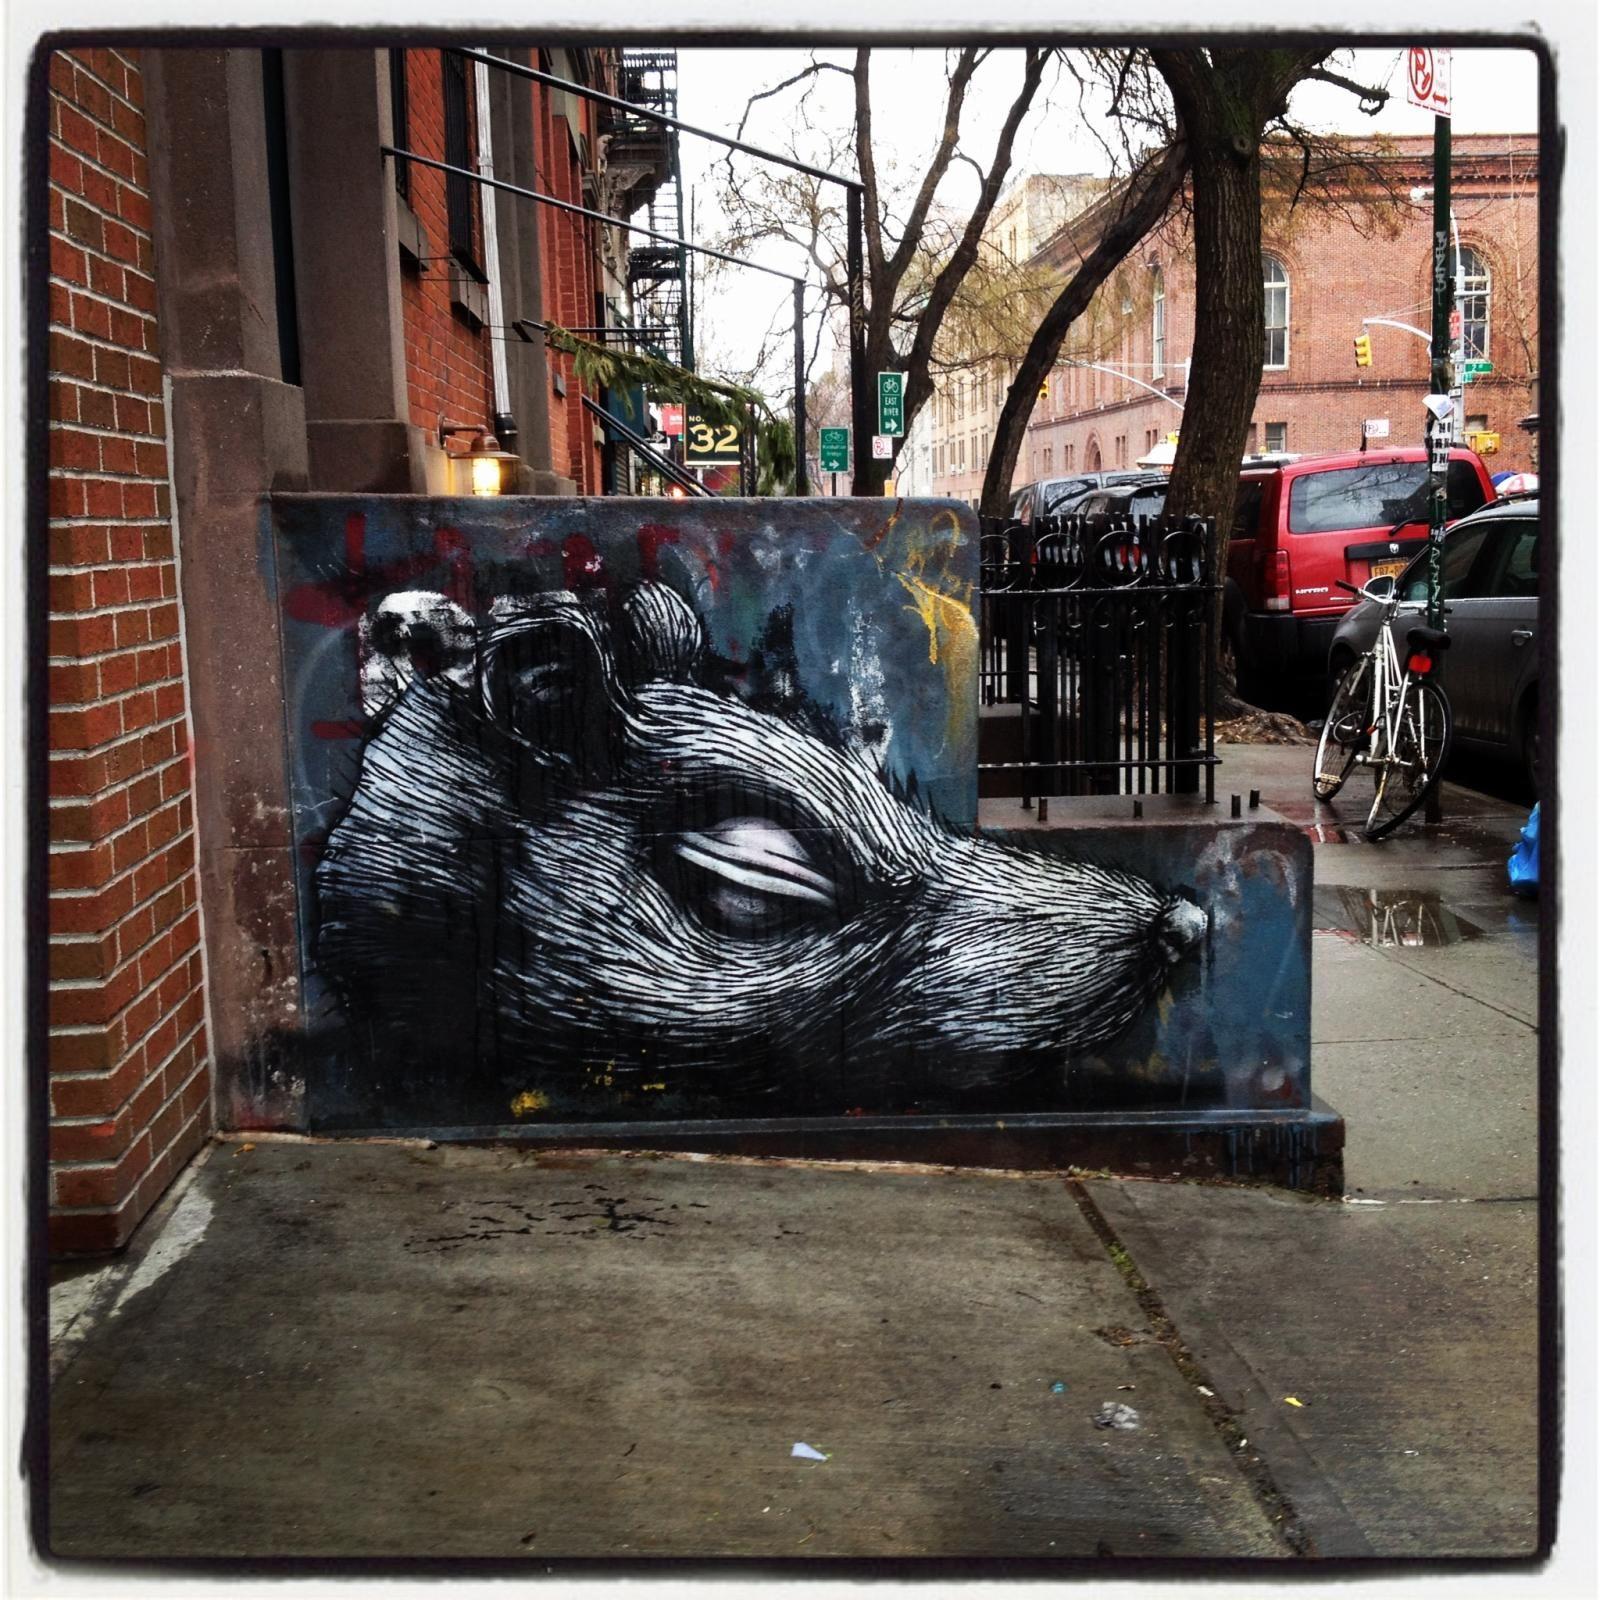 Artwork By Roa in New York City